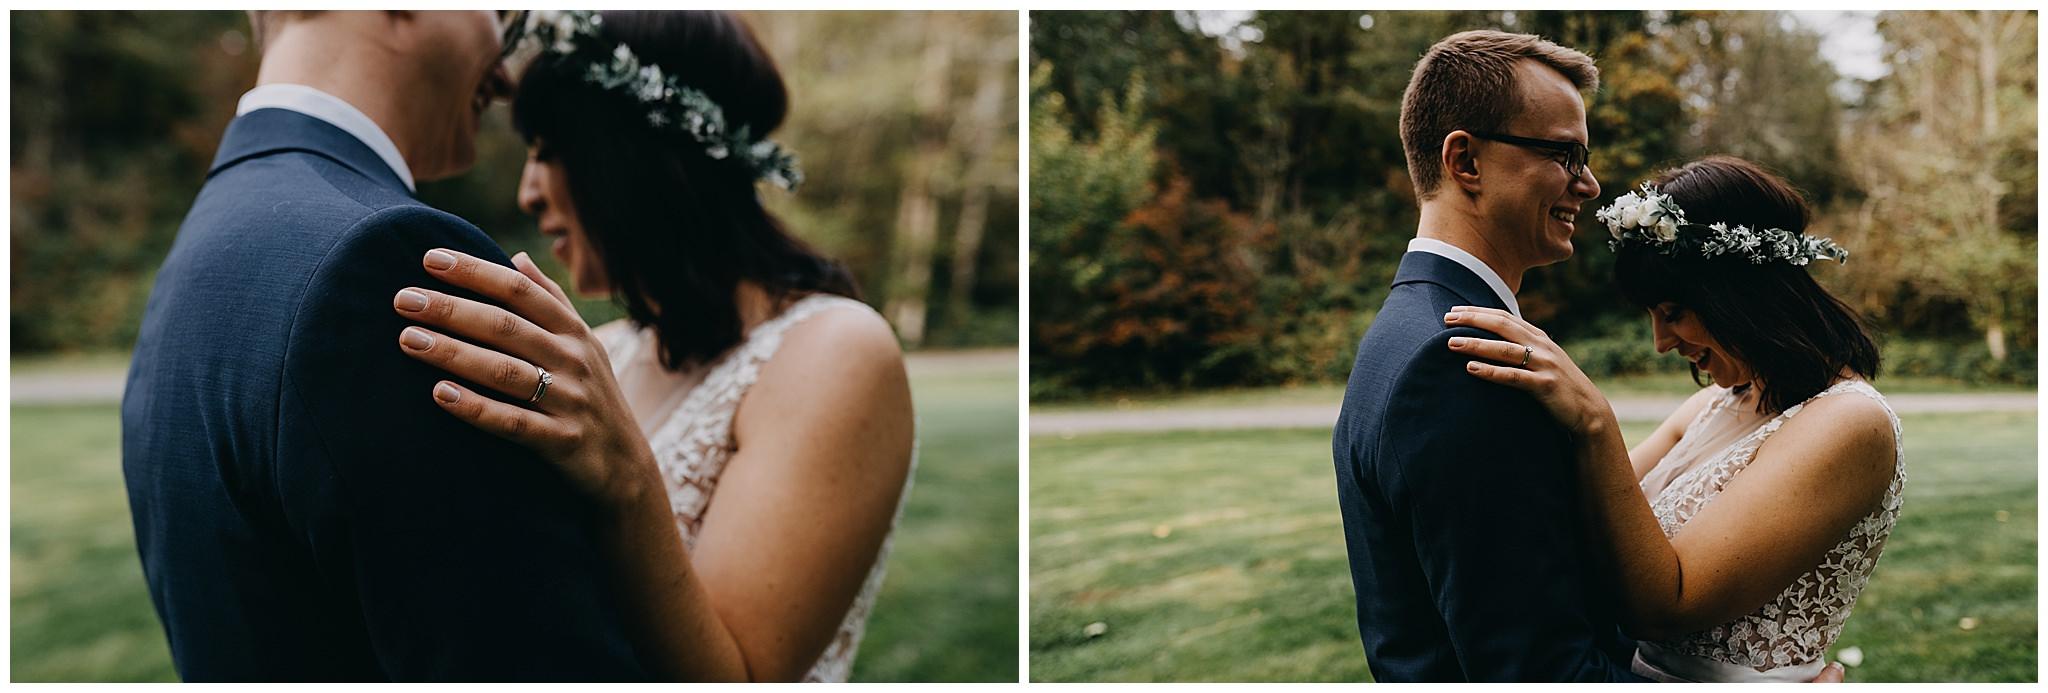 wallace-falls-lodge-wedding-evan-kelsey46.jpg